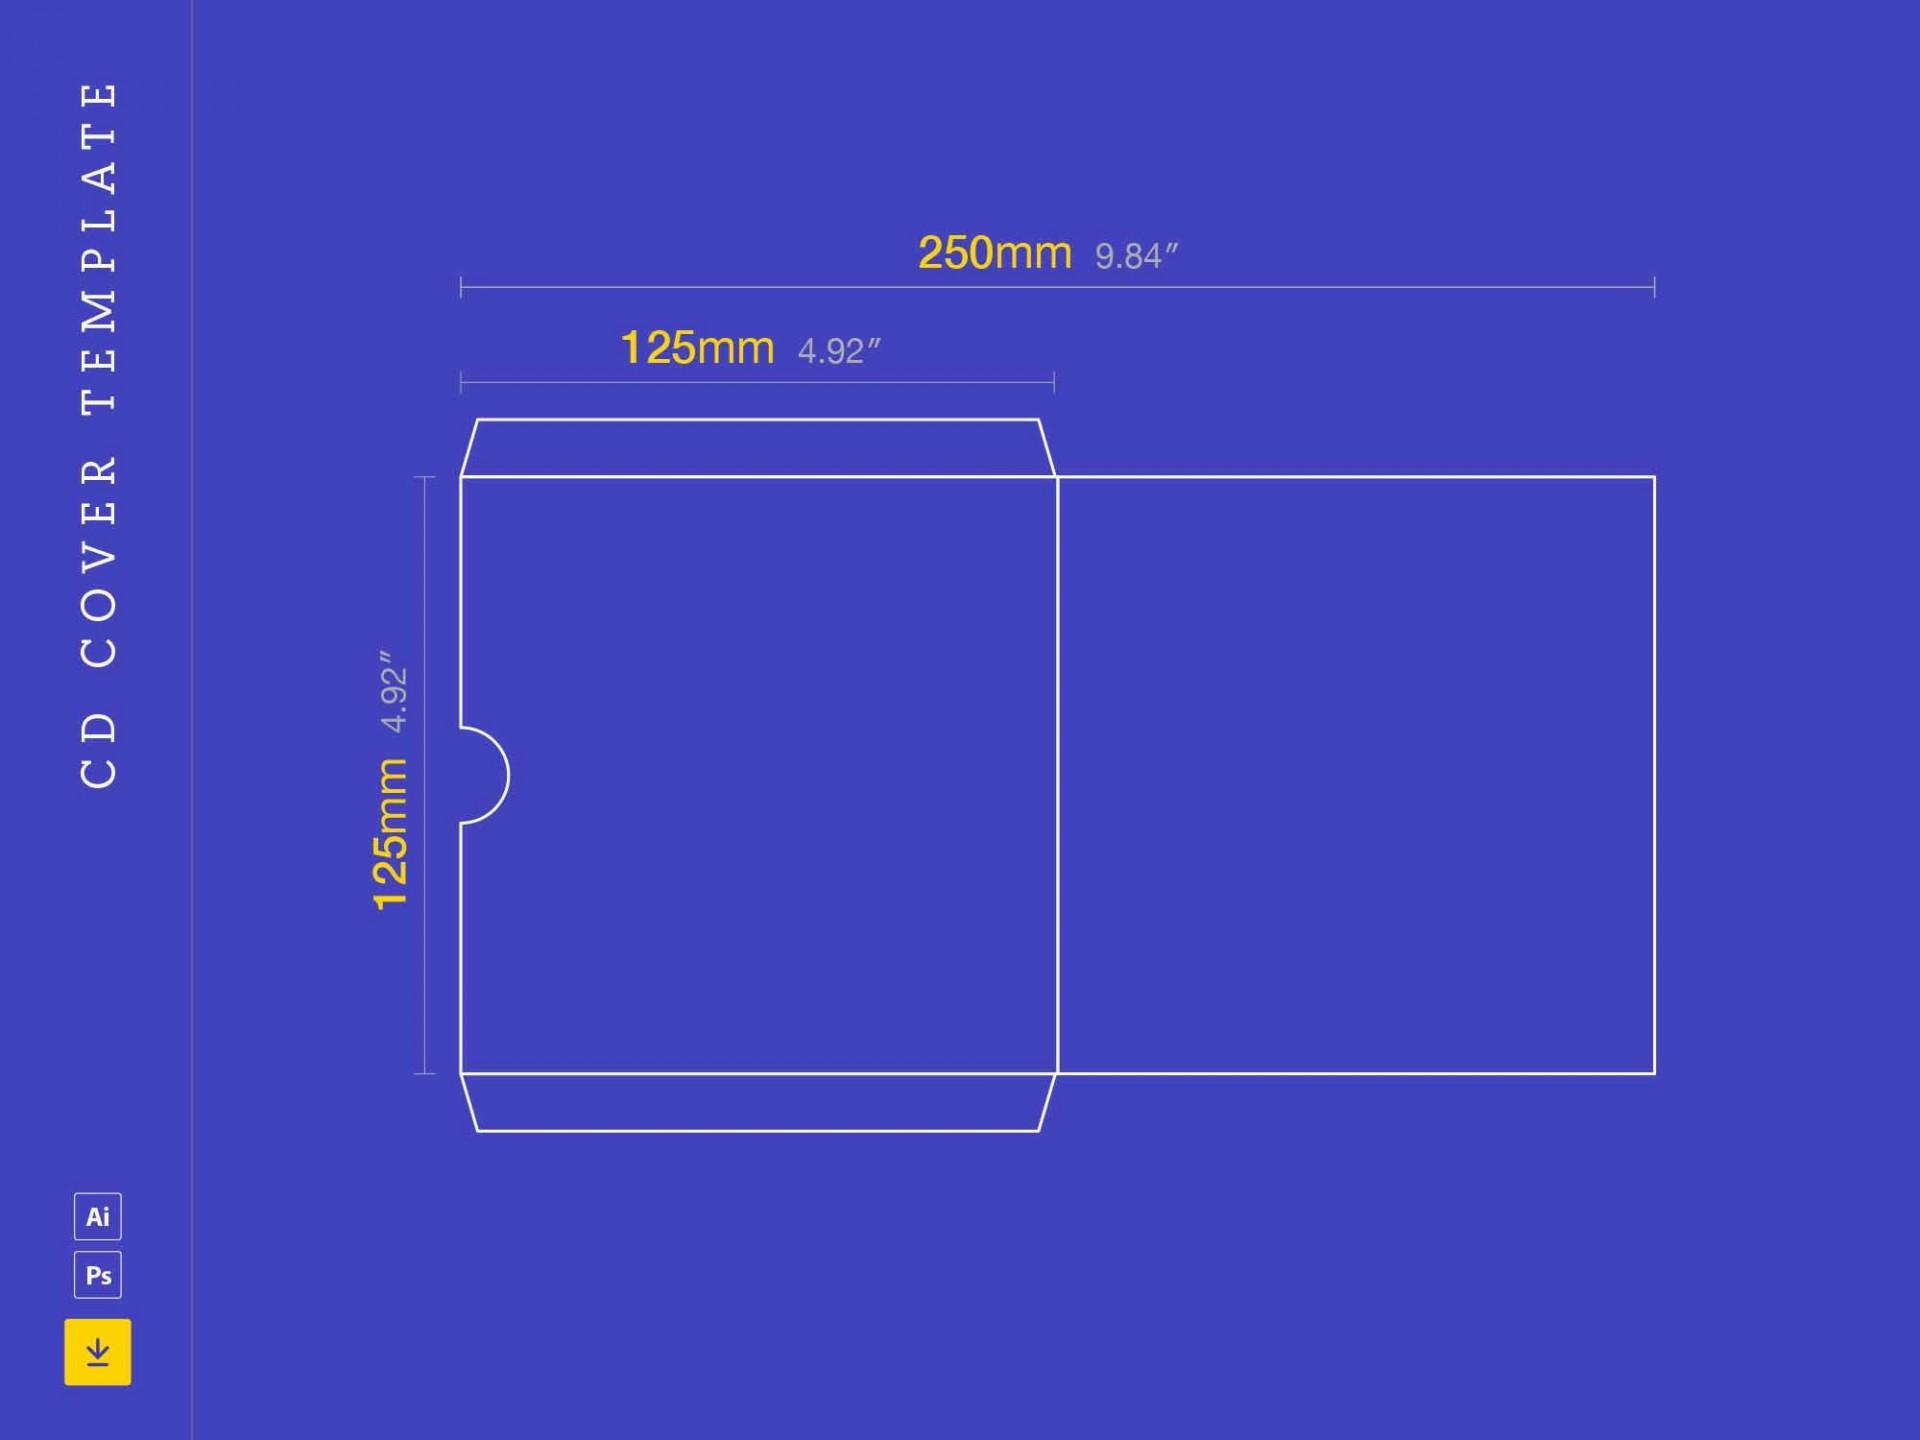 003 Fantastic Cd Cover Design Template Photoshop Sample  Label Psd Free1920